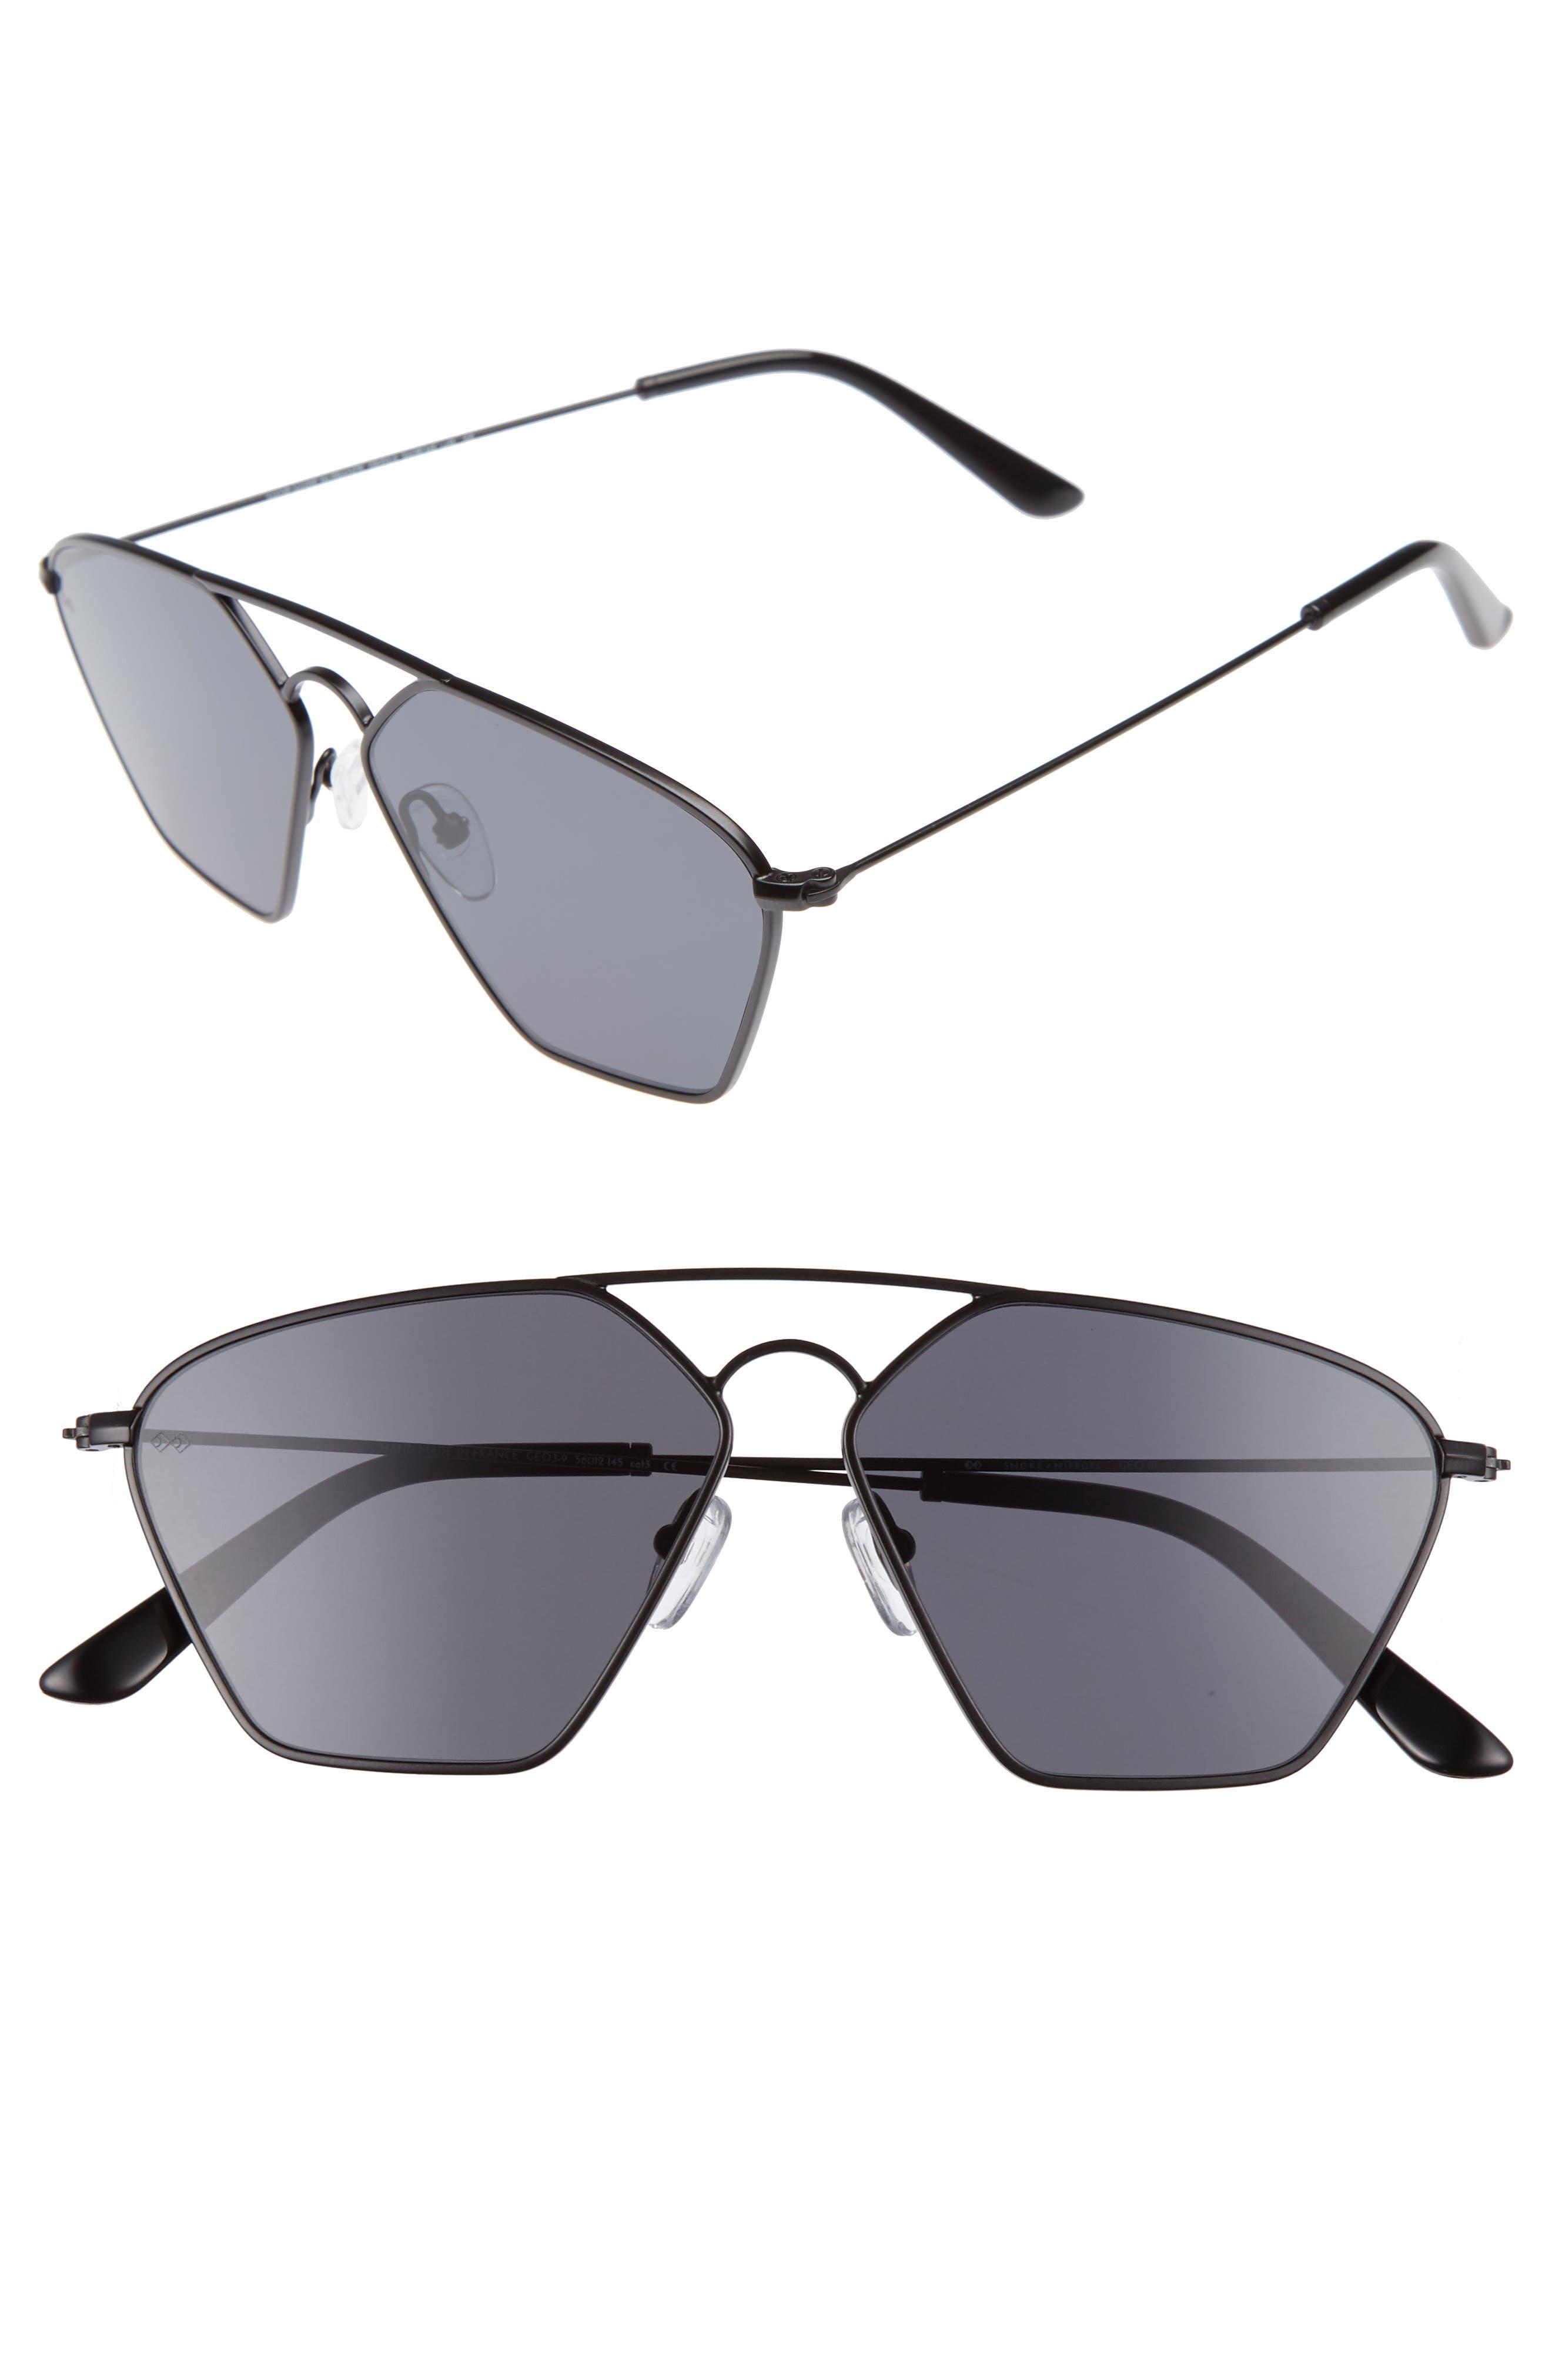 Geo 3 56mm Retro Sunglasses,                         Main,                         color, Matte Black/ Dark Black